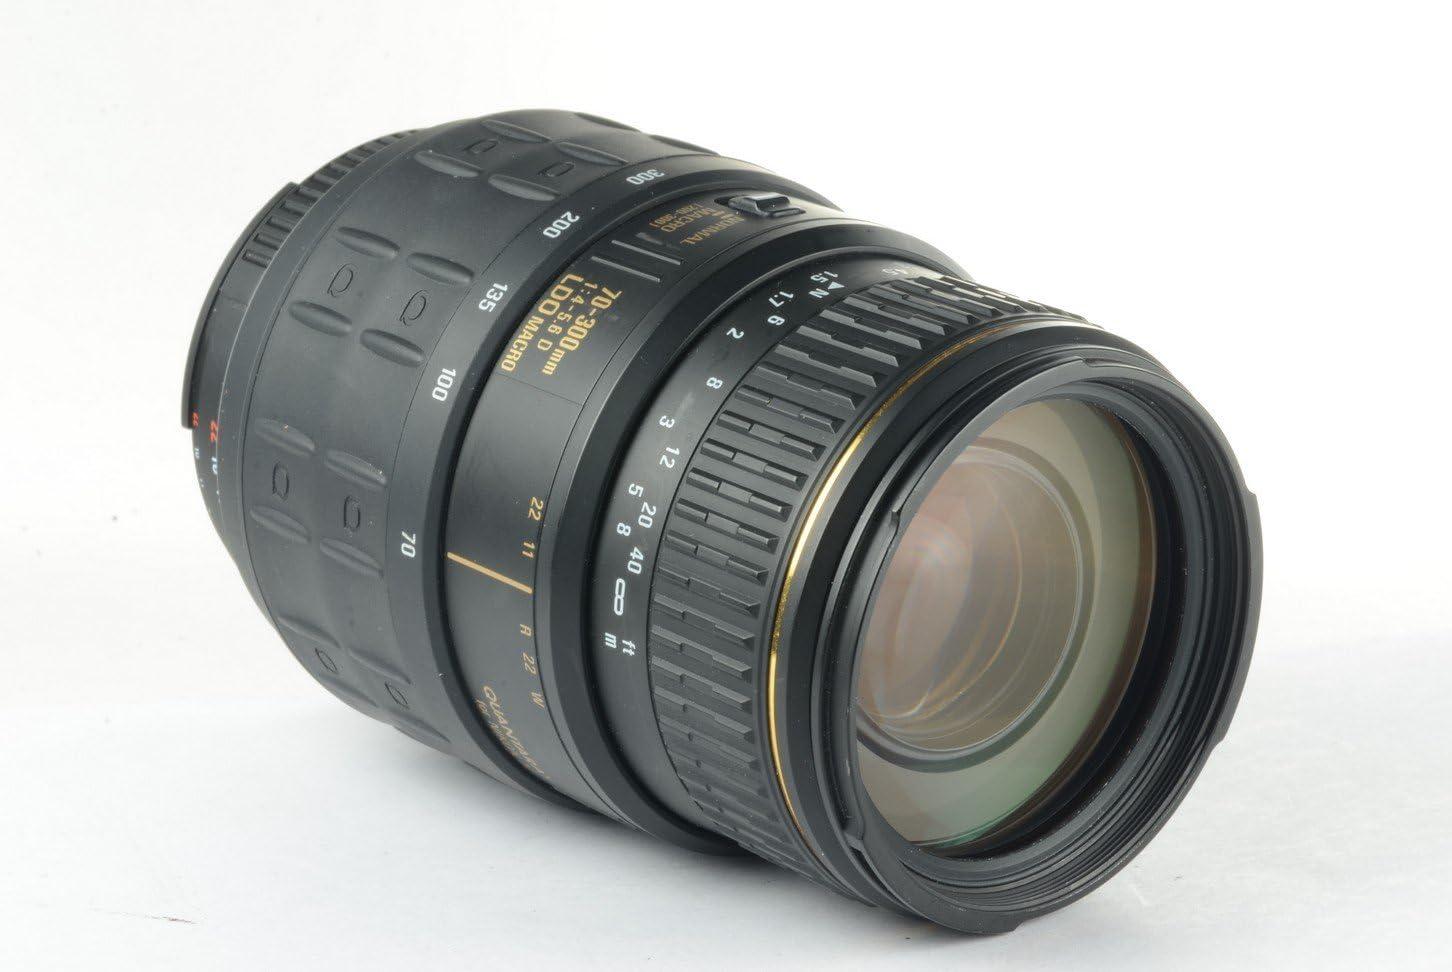 Quantaray 70 300mm F 4 5 6 Macro 1 2 Auto Focus Zoom Camera Photo